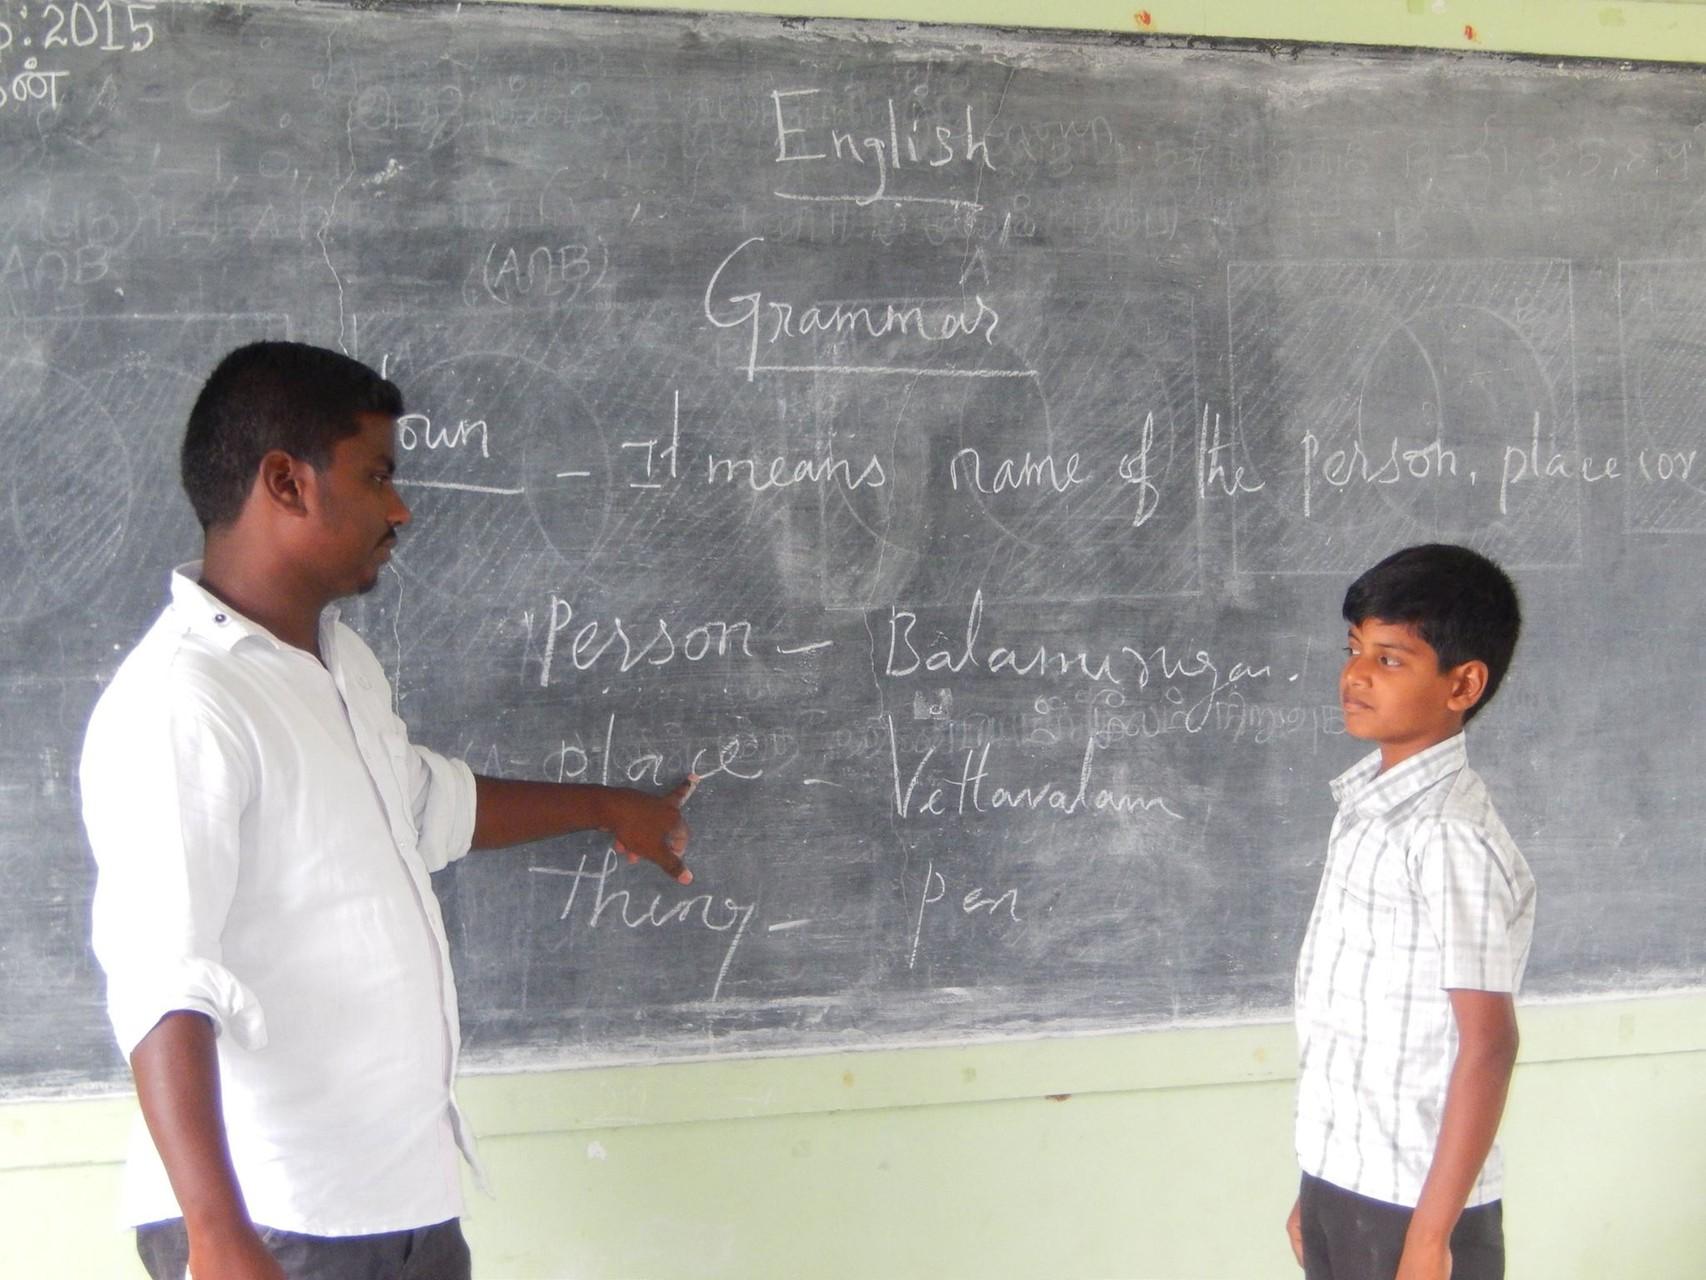 2015 - Cours d'anglais